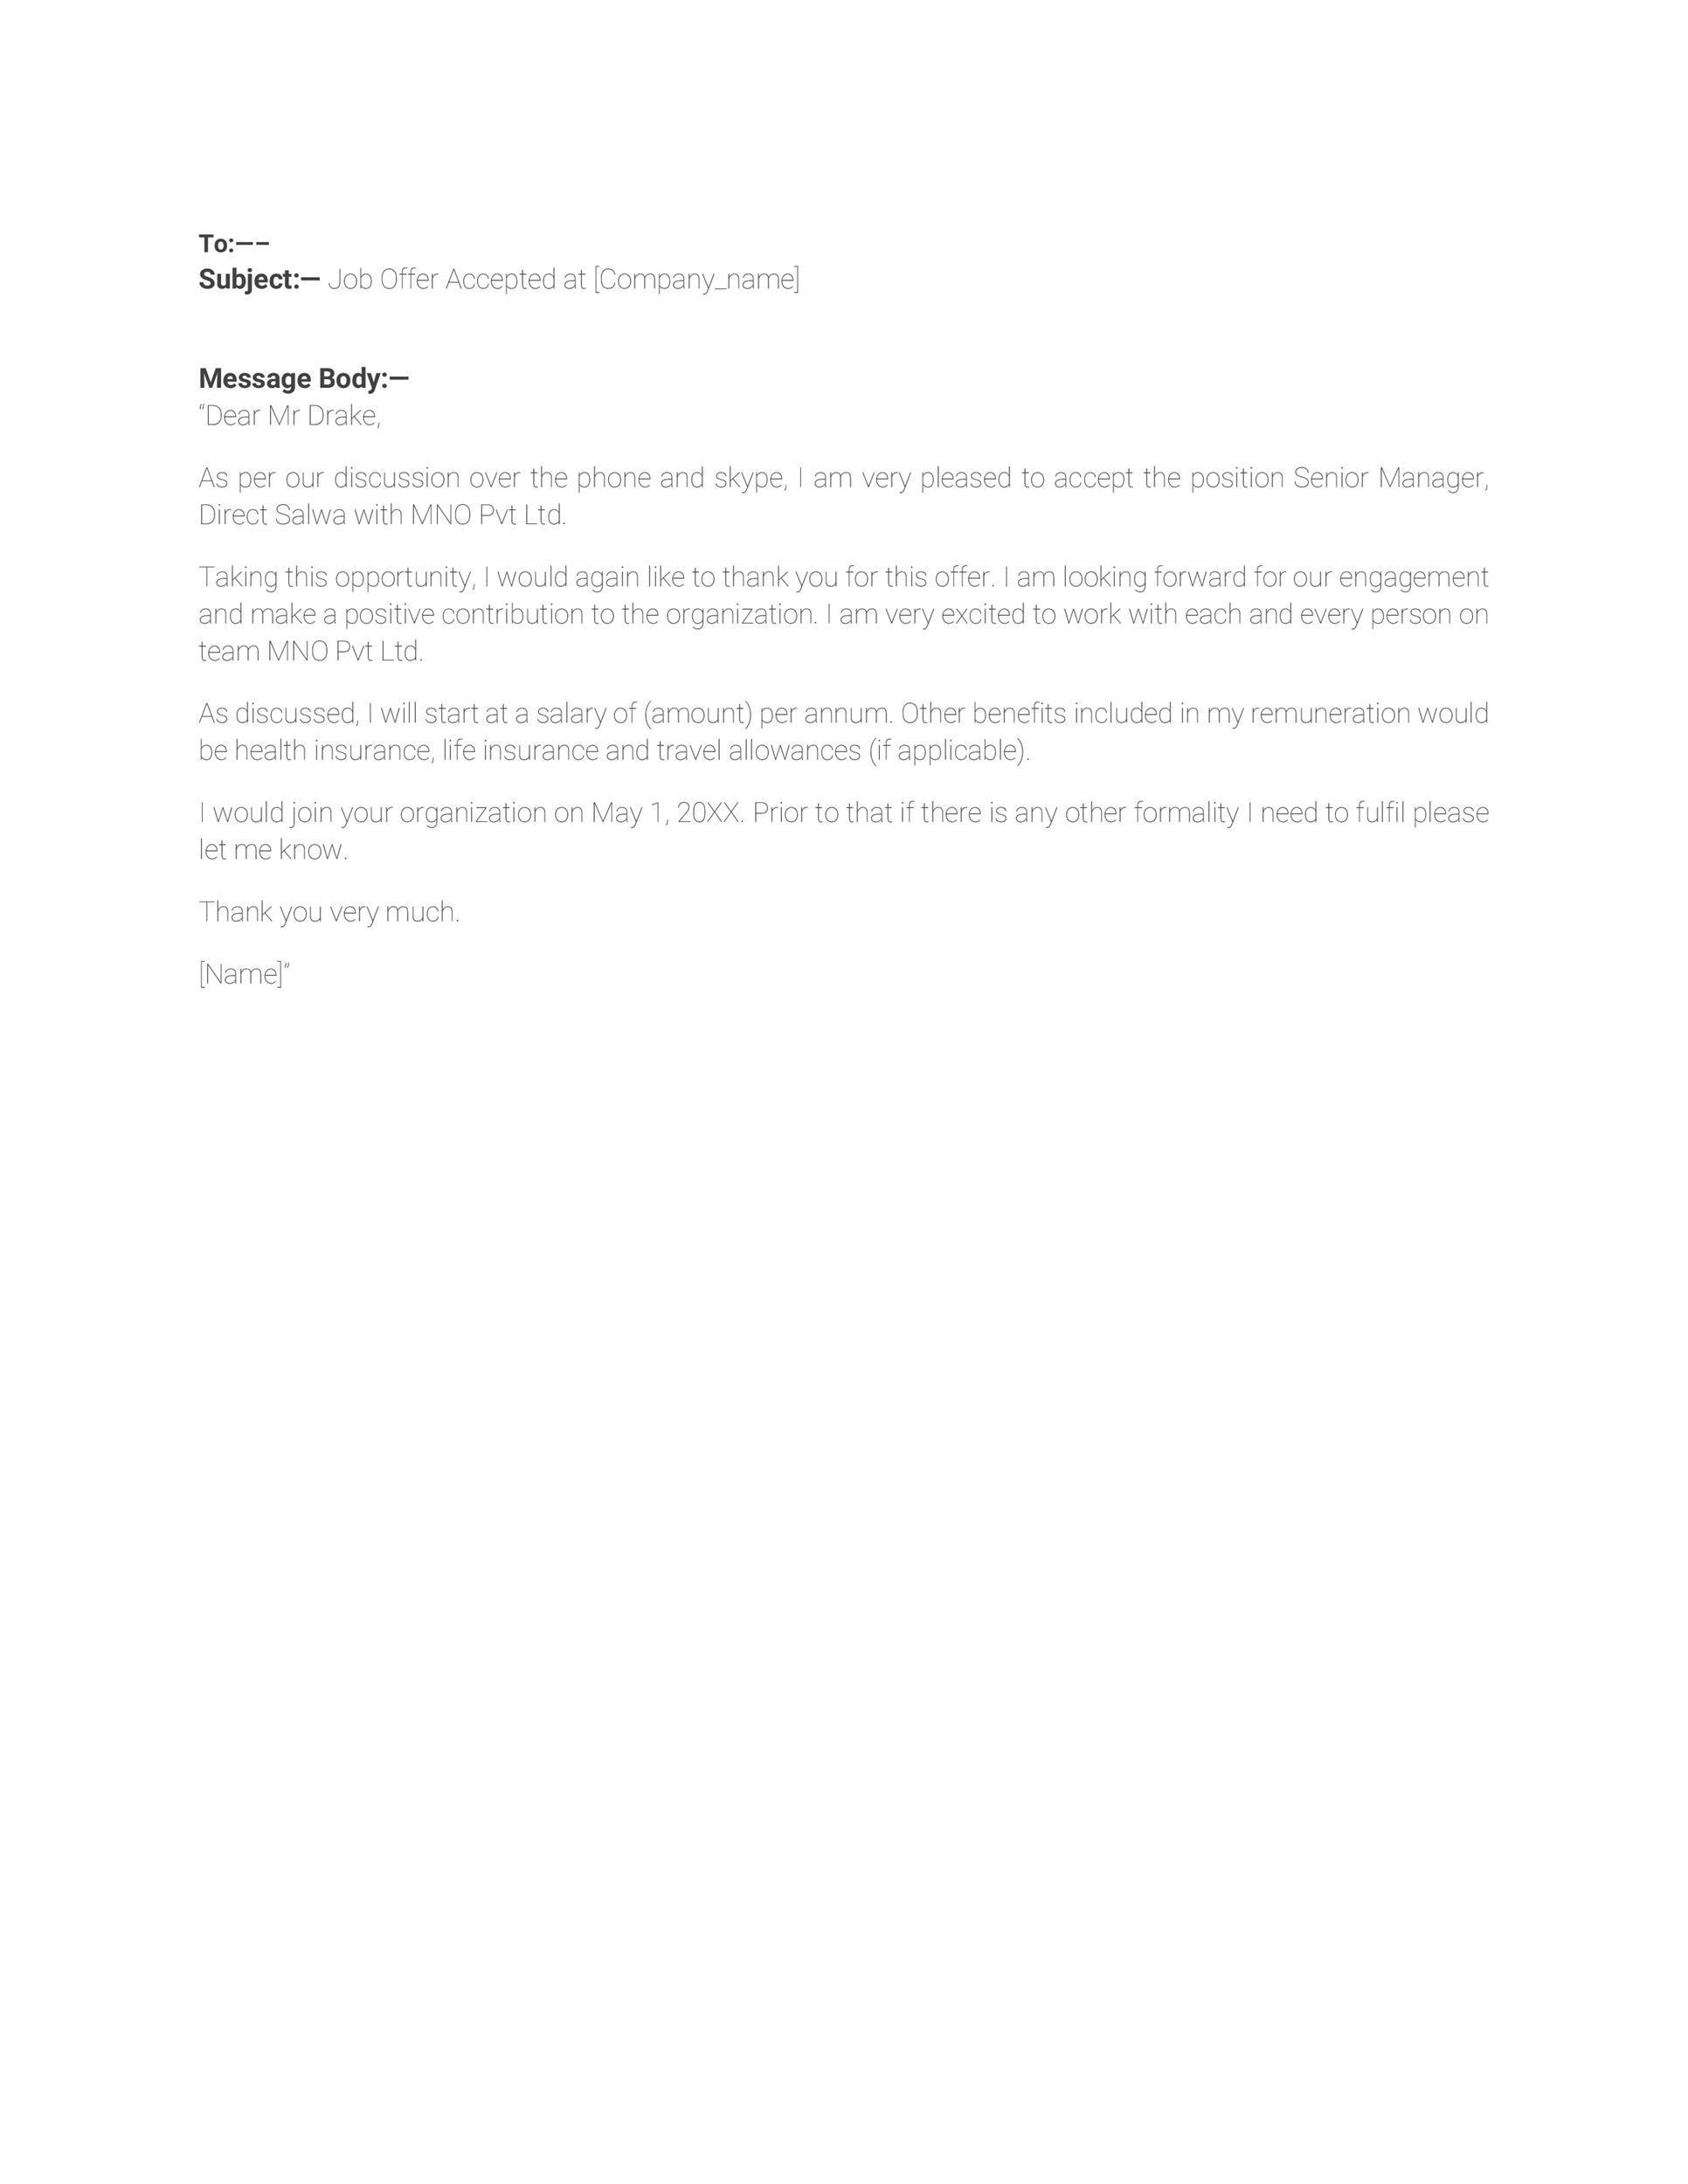 Free job acceptance letter 07